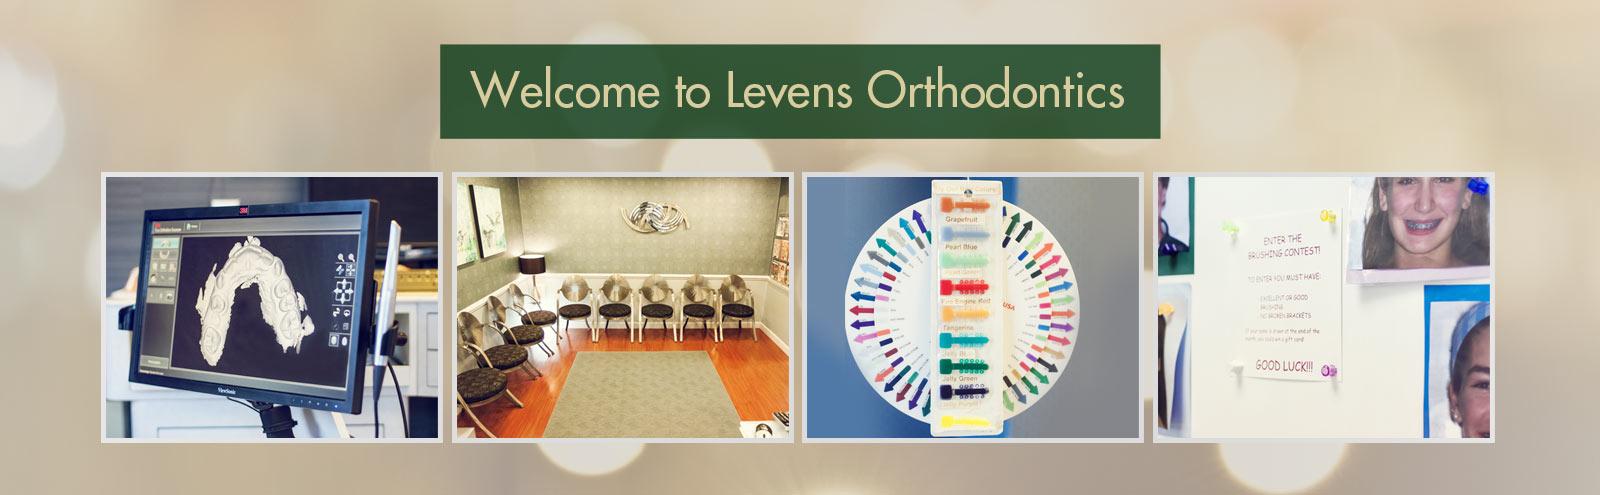 Welcome to levens orthodontics